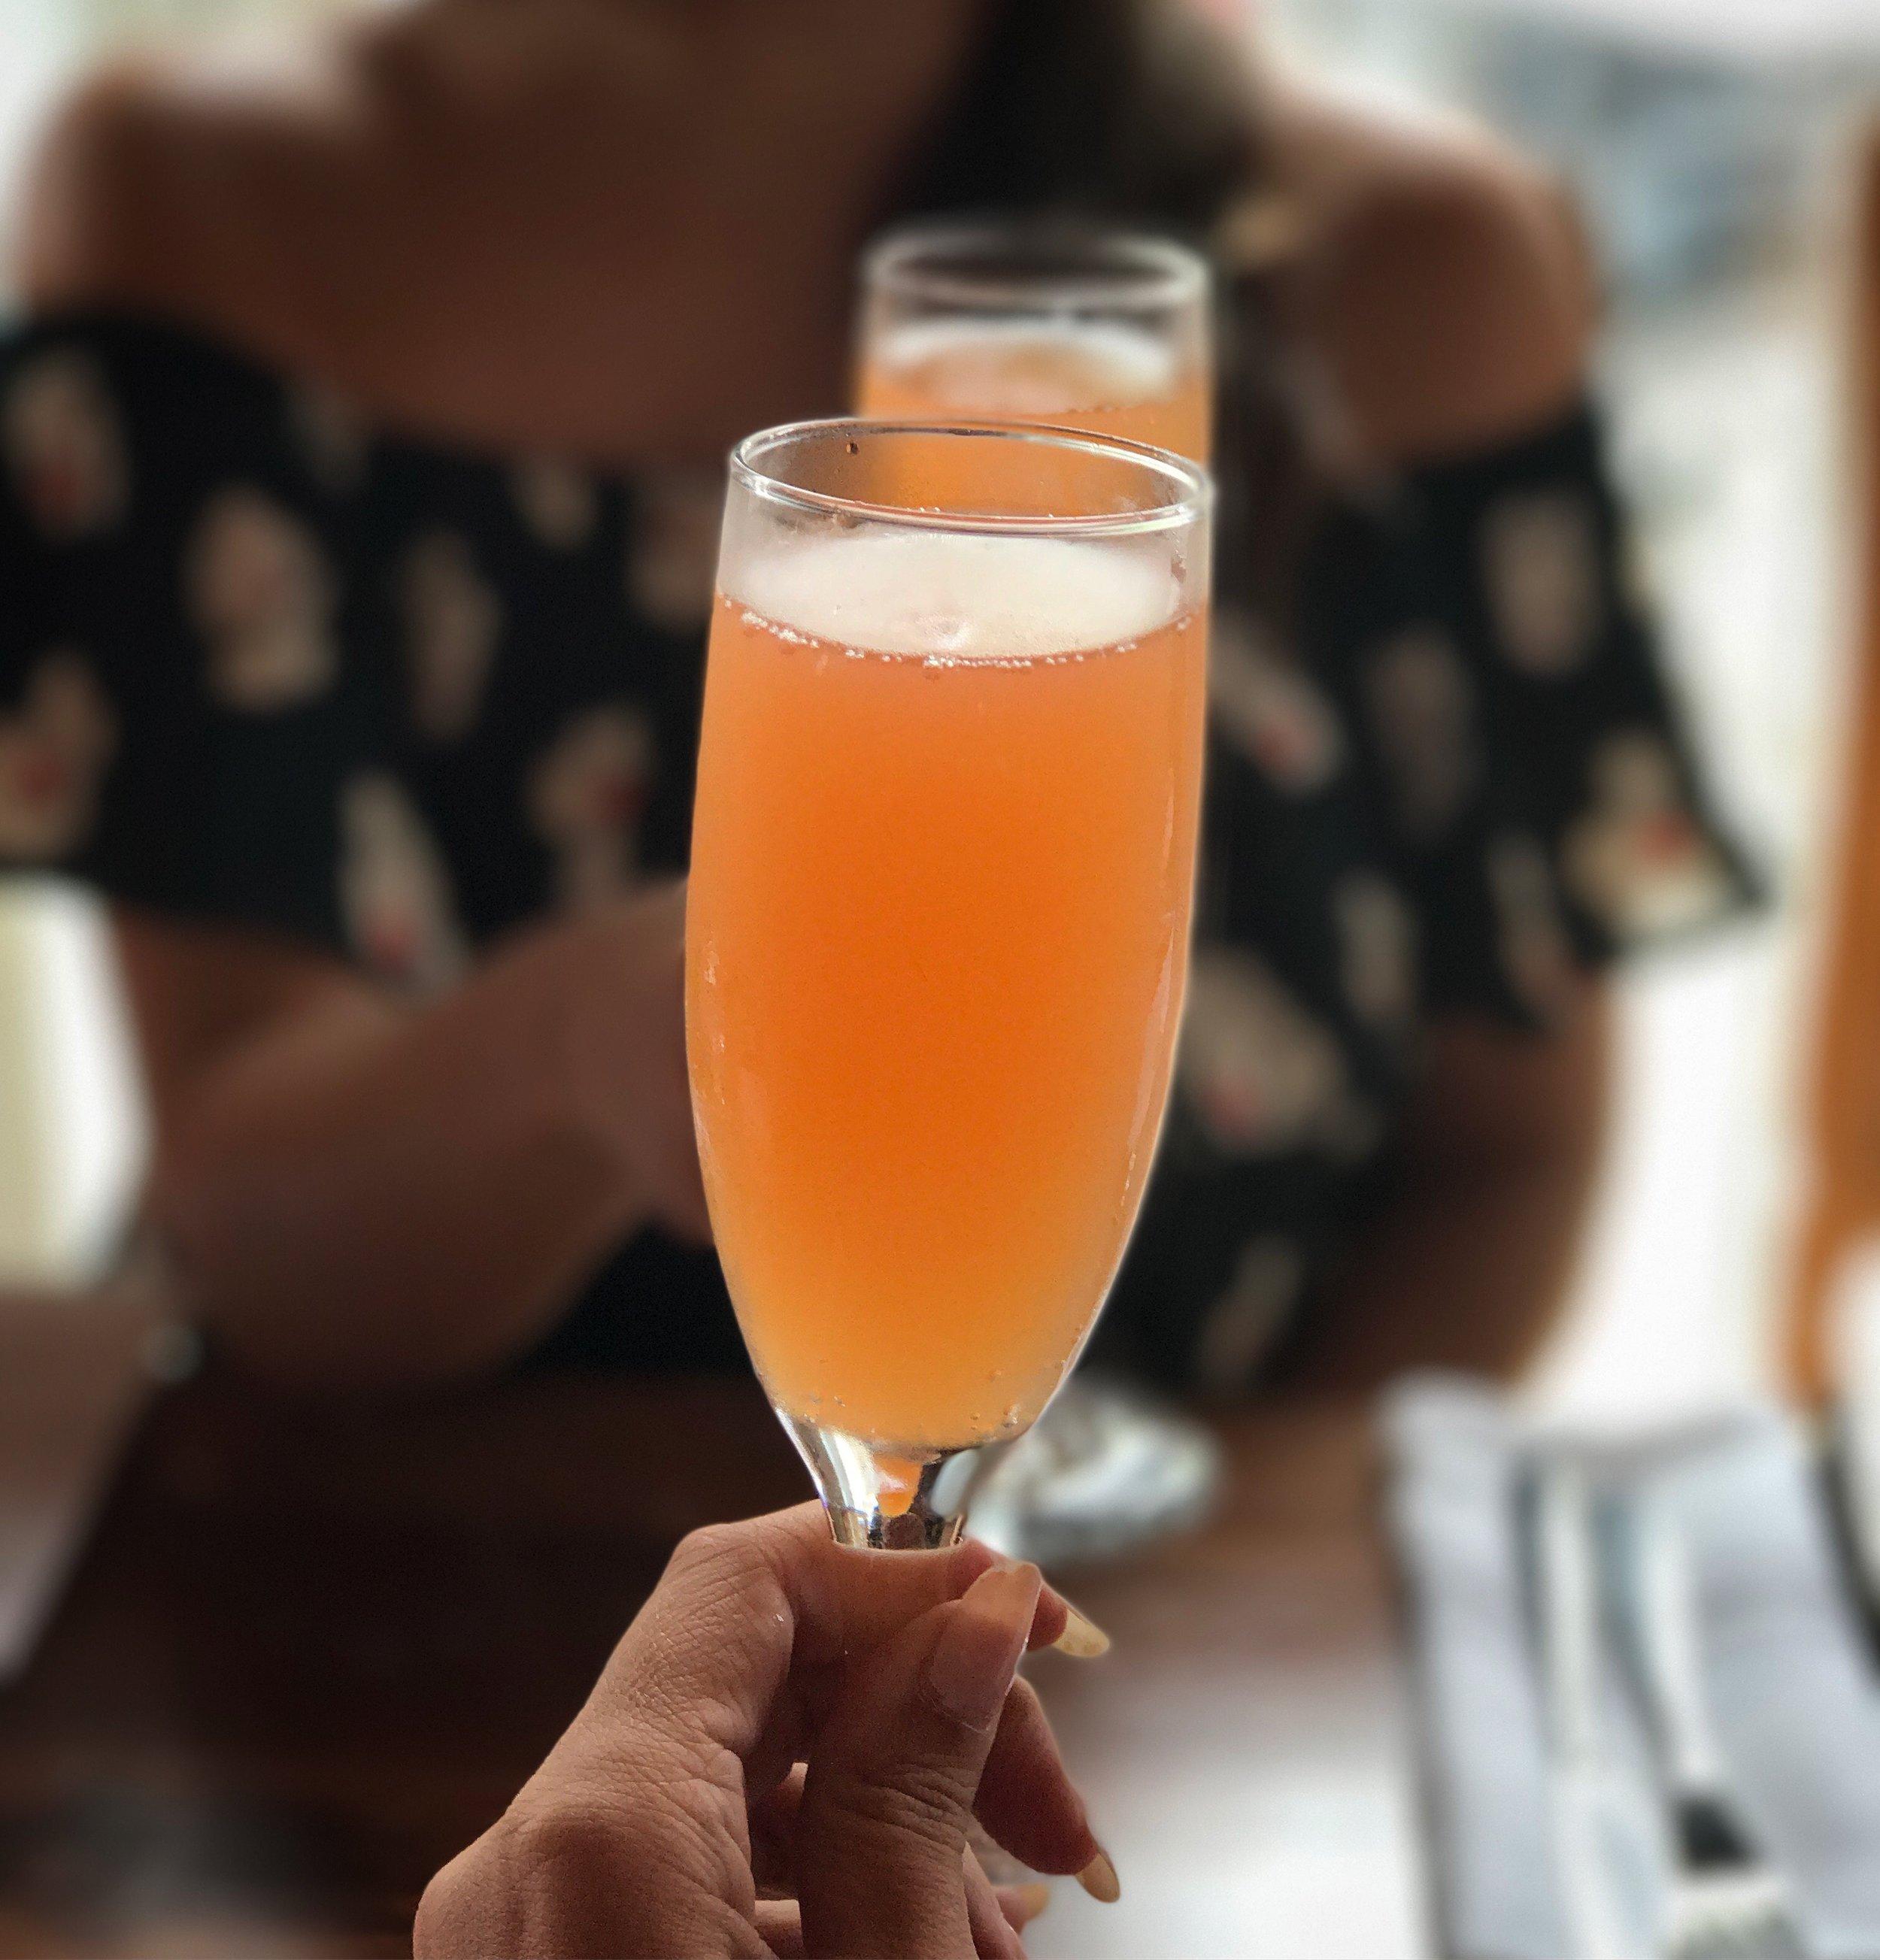 PINCH Miami Bubbly brunch